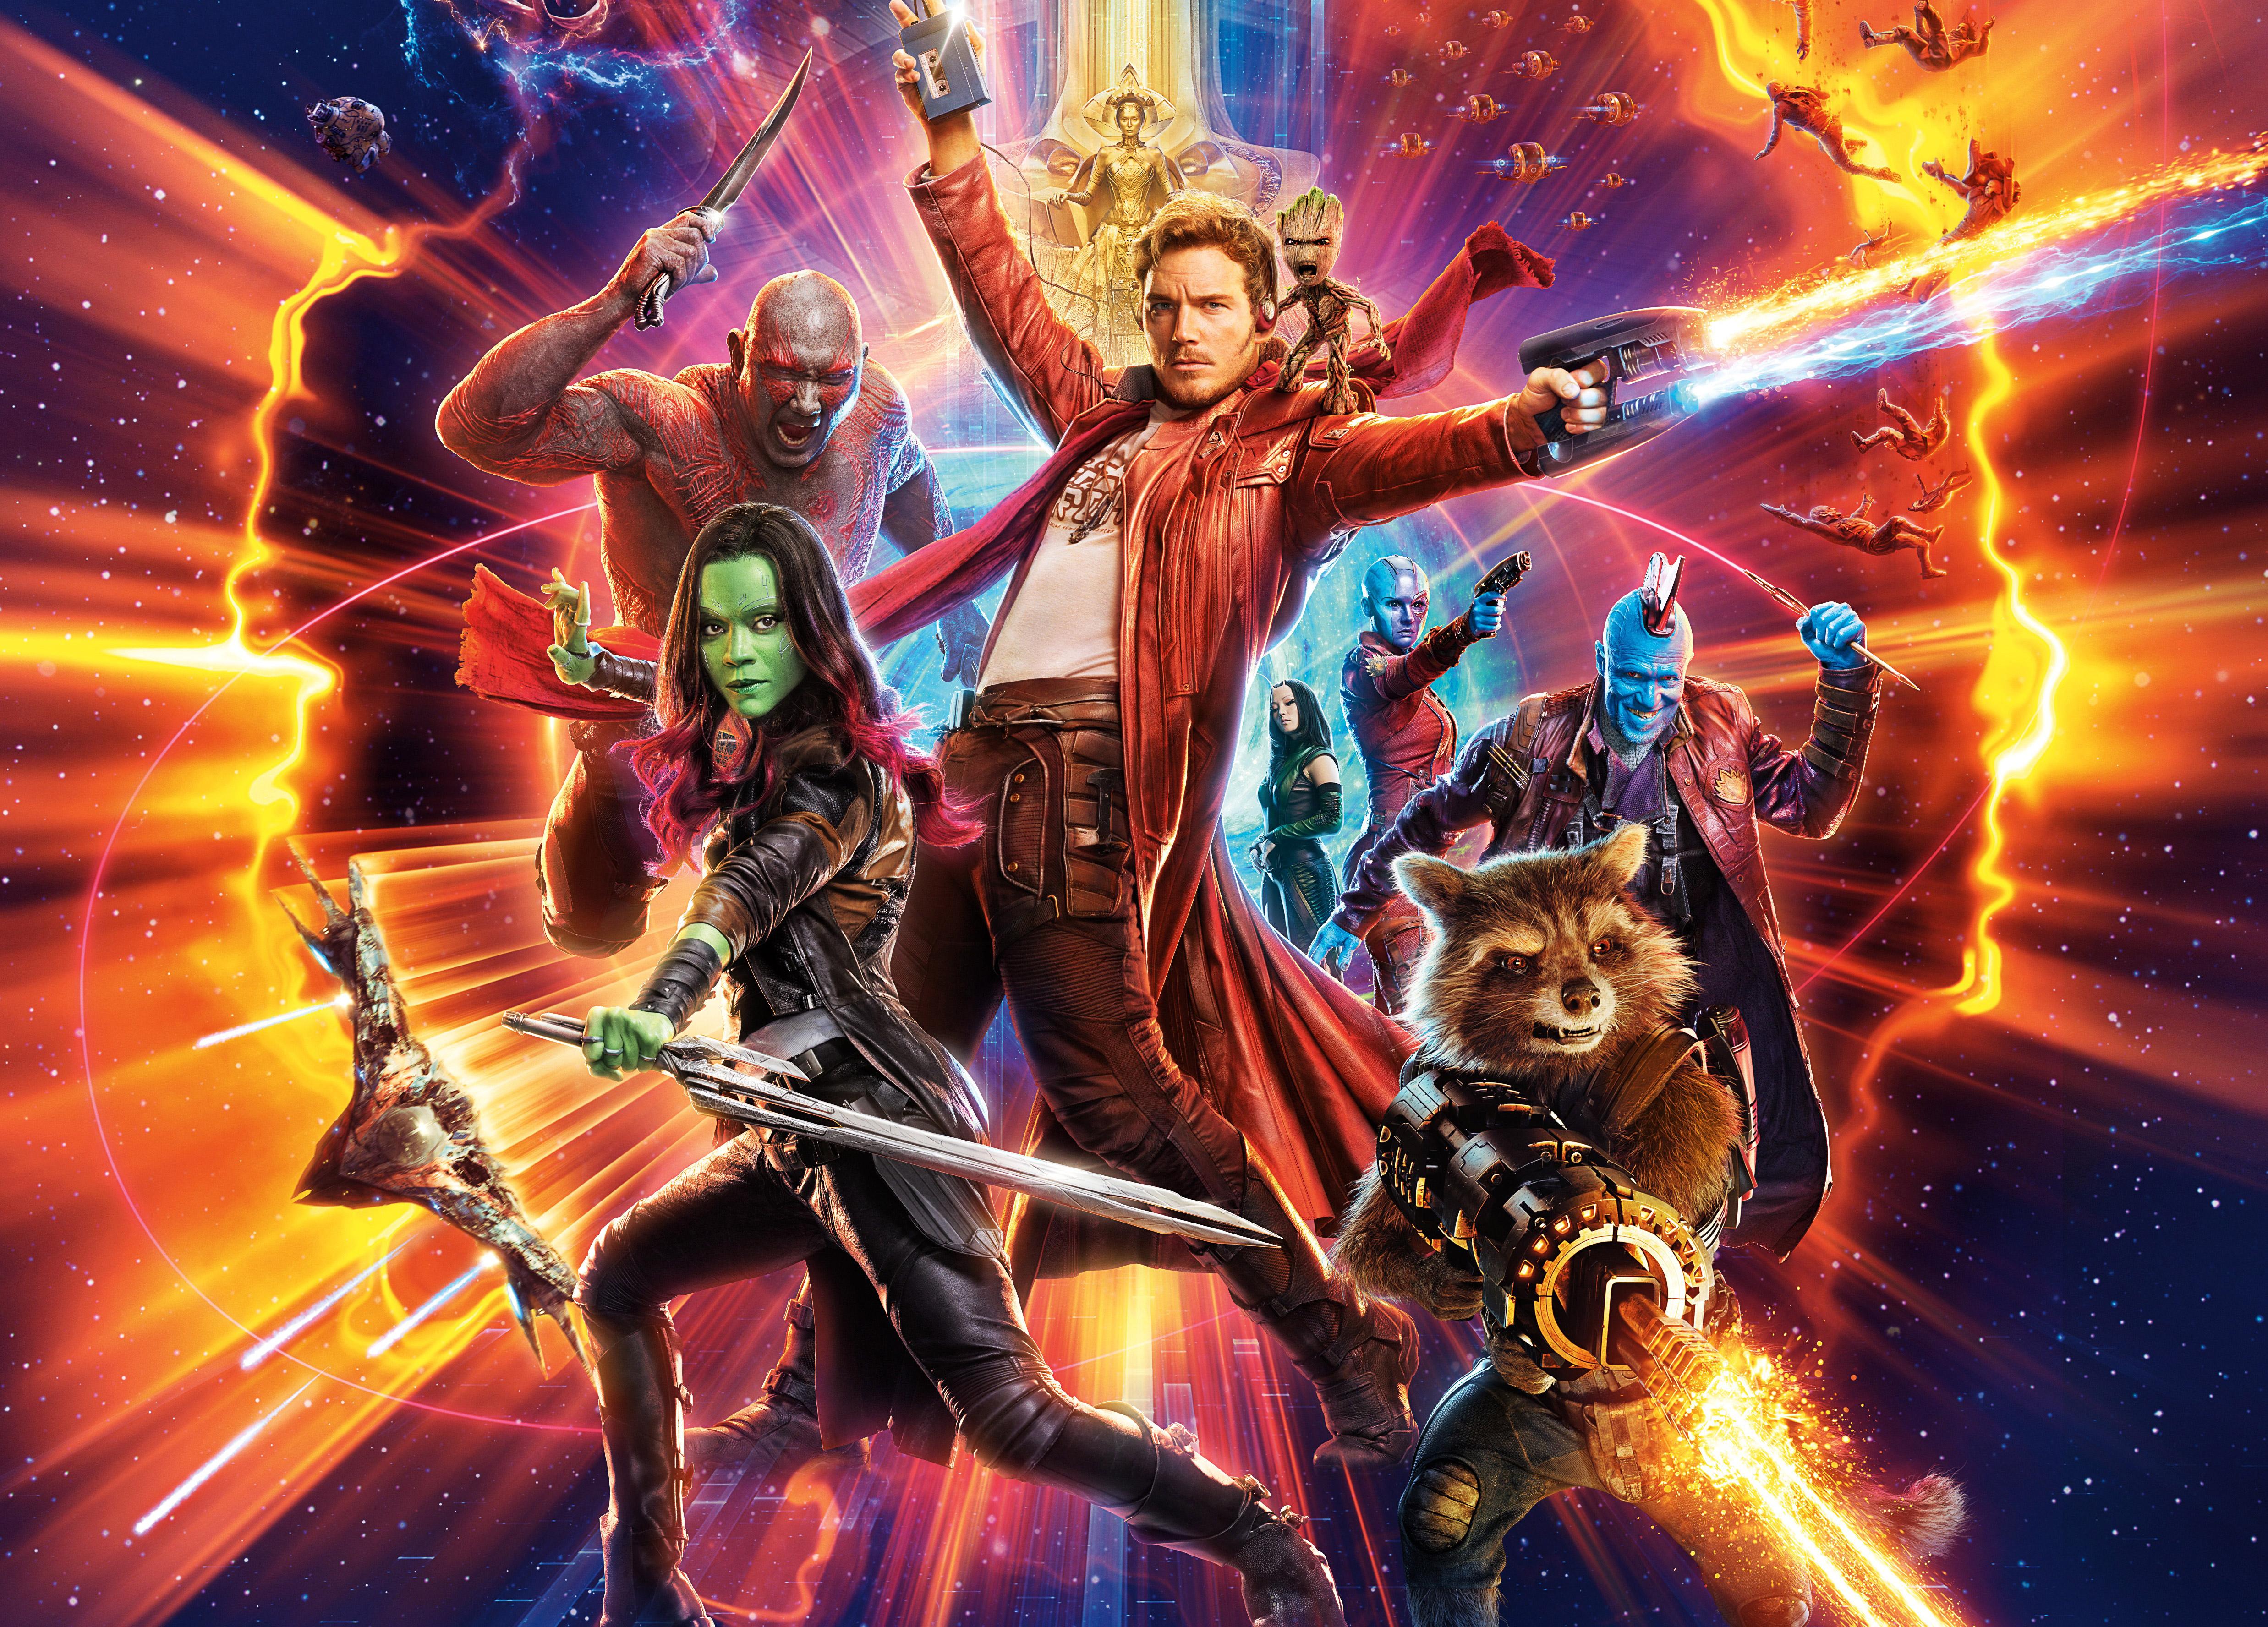 Guardians Of The Galaxy Vol 2 Wallpaper: Guardians Of The Galaxy Vol 2 5k 4k HD, HD Movies, 4k